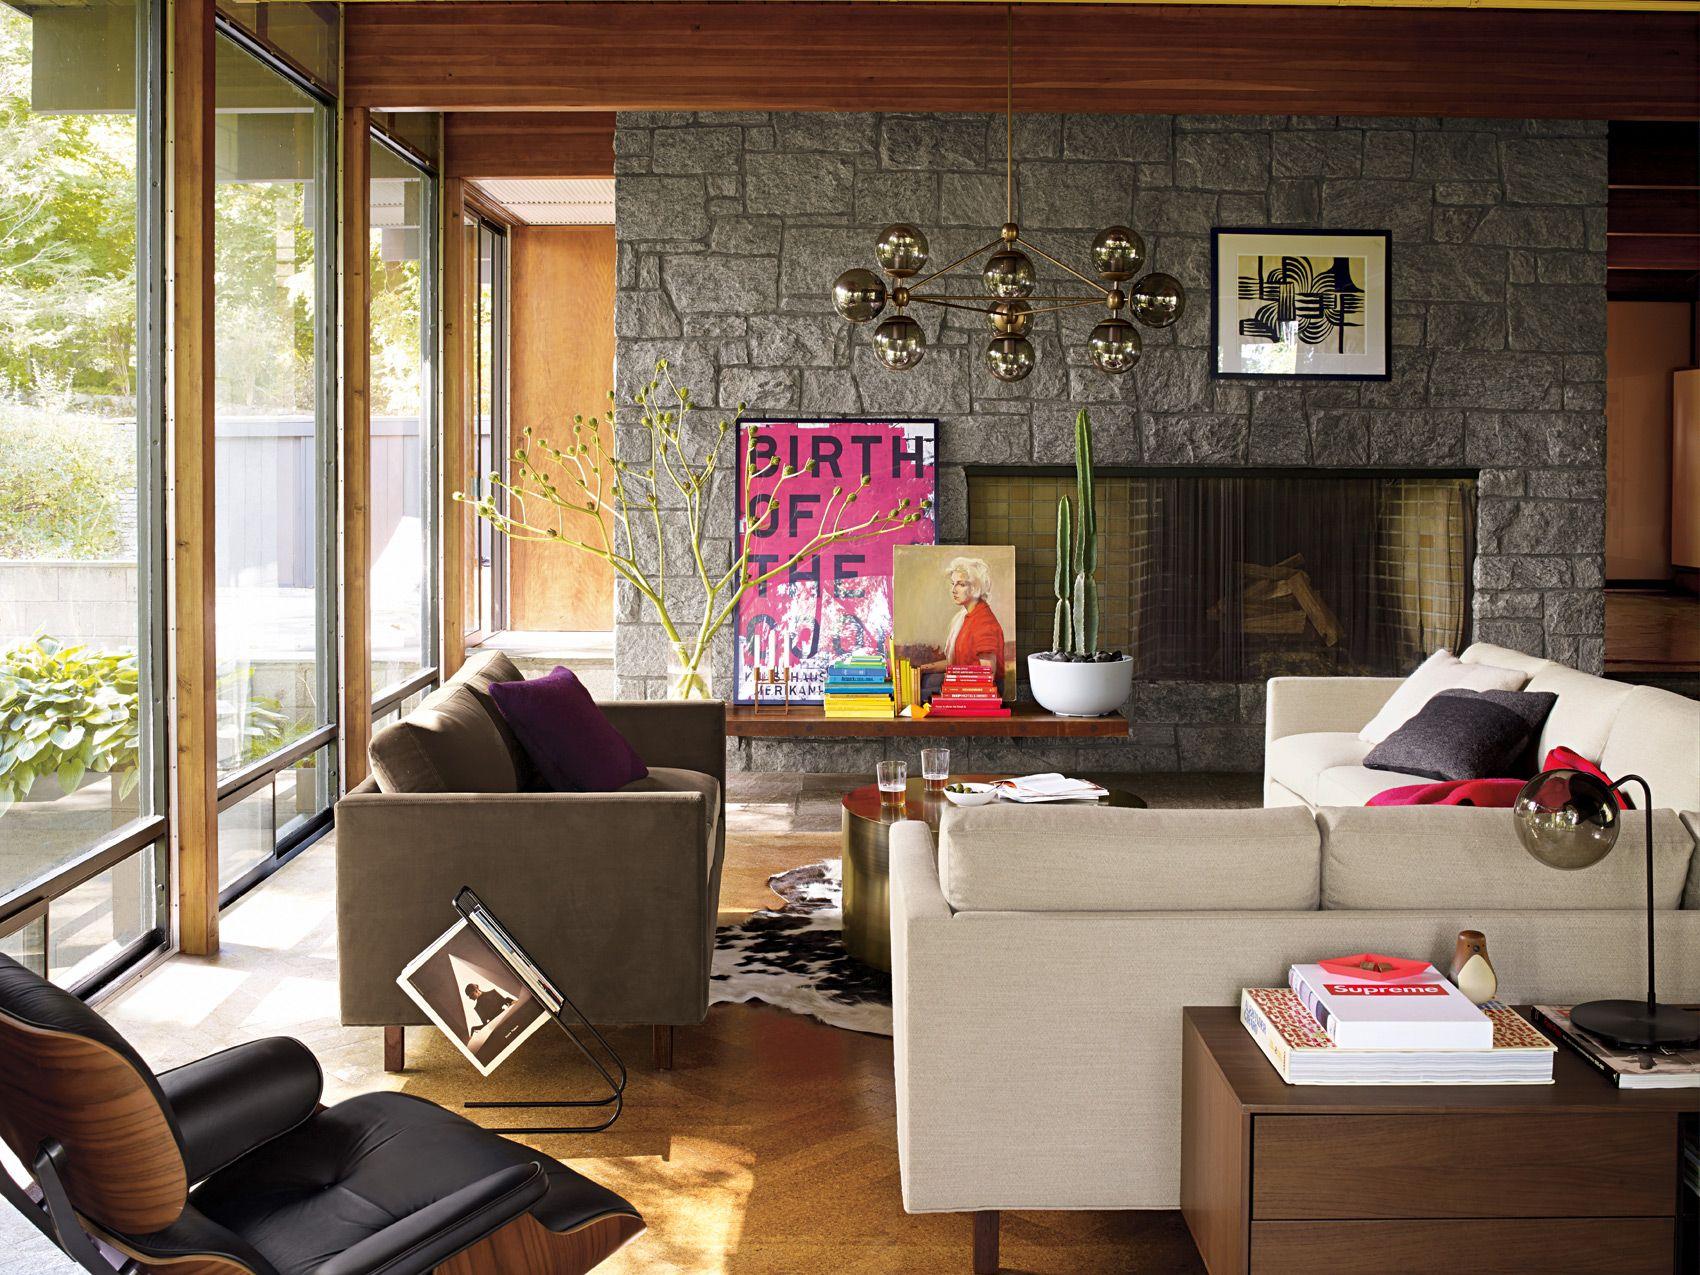 Goodland Sofa Collection Designed by Milo Baughman